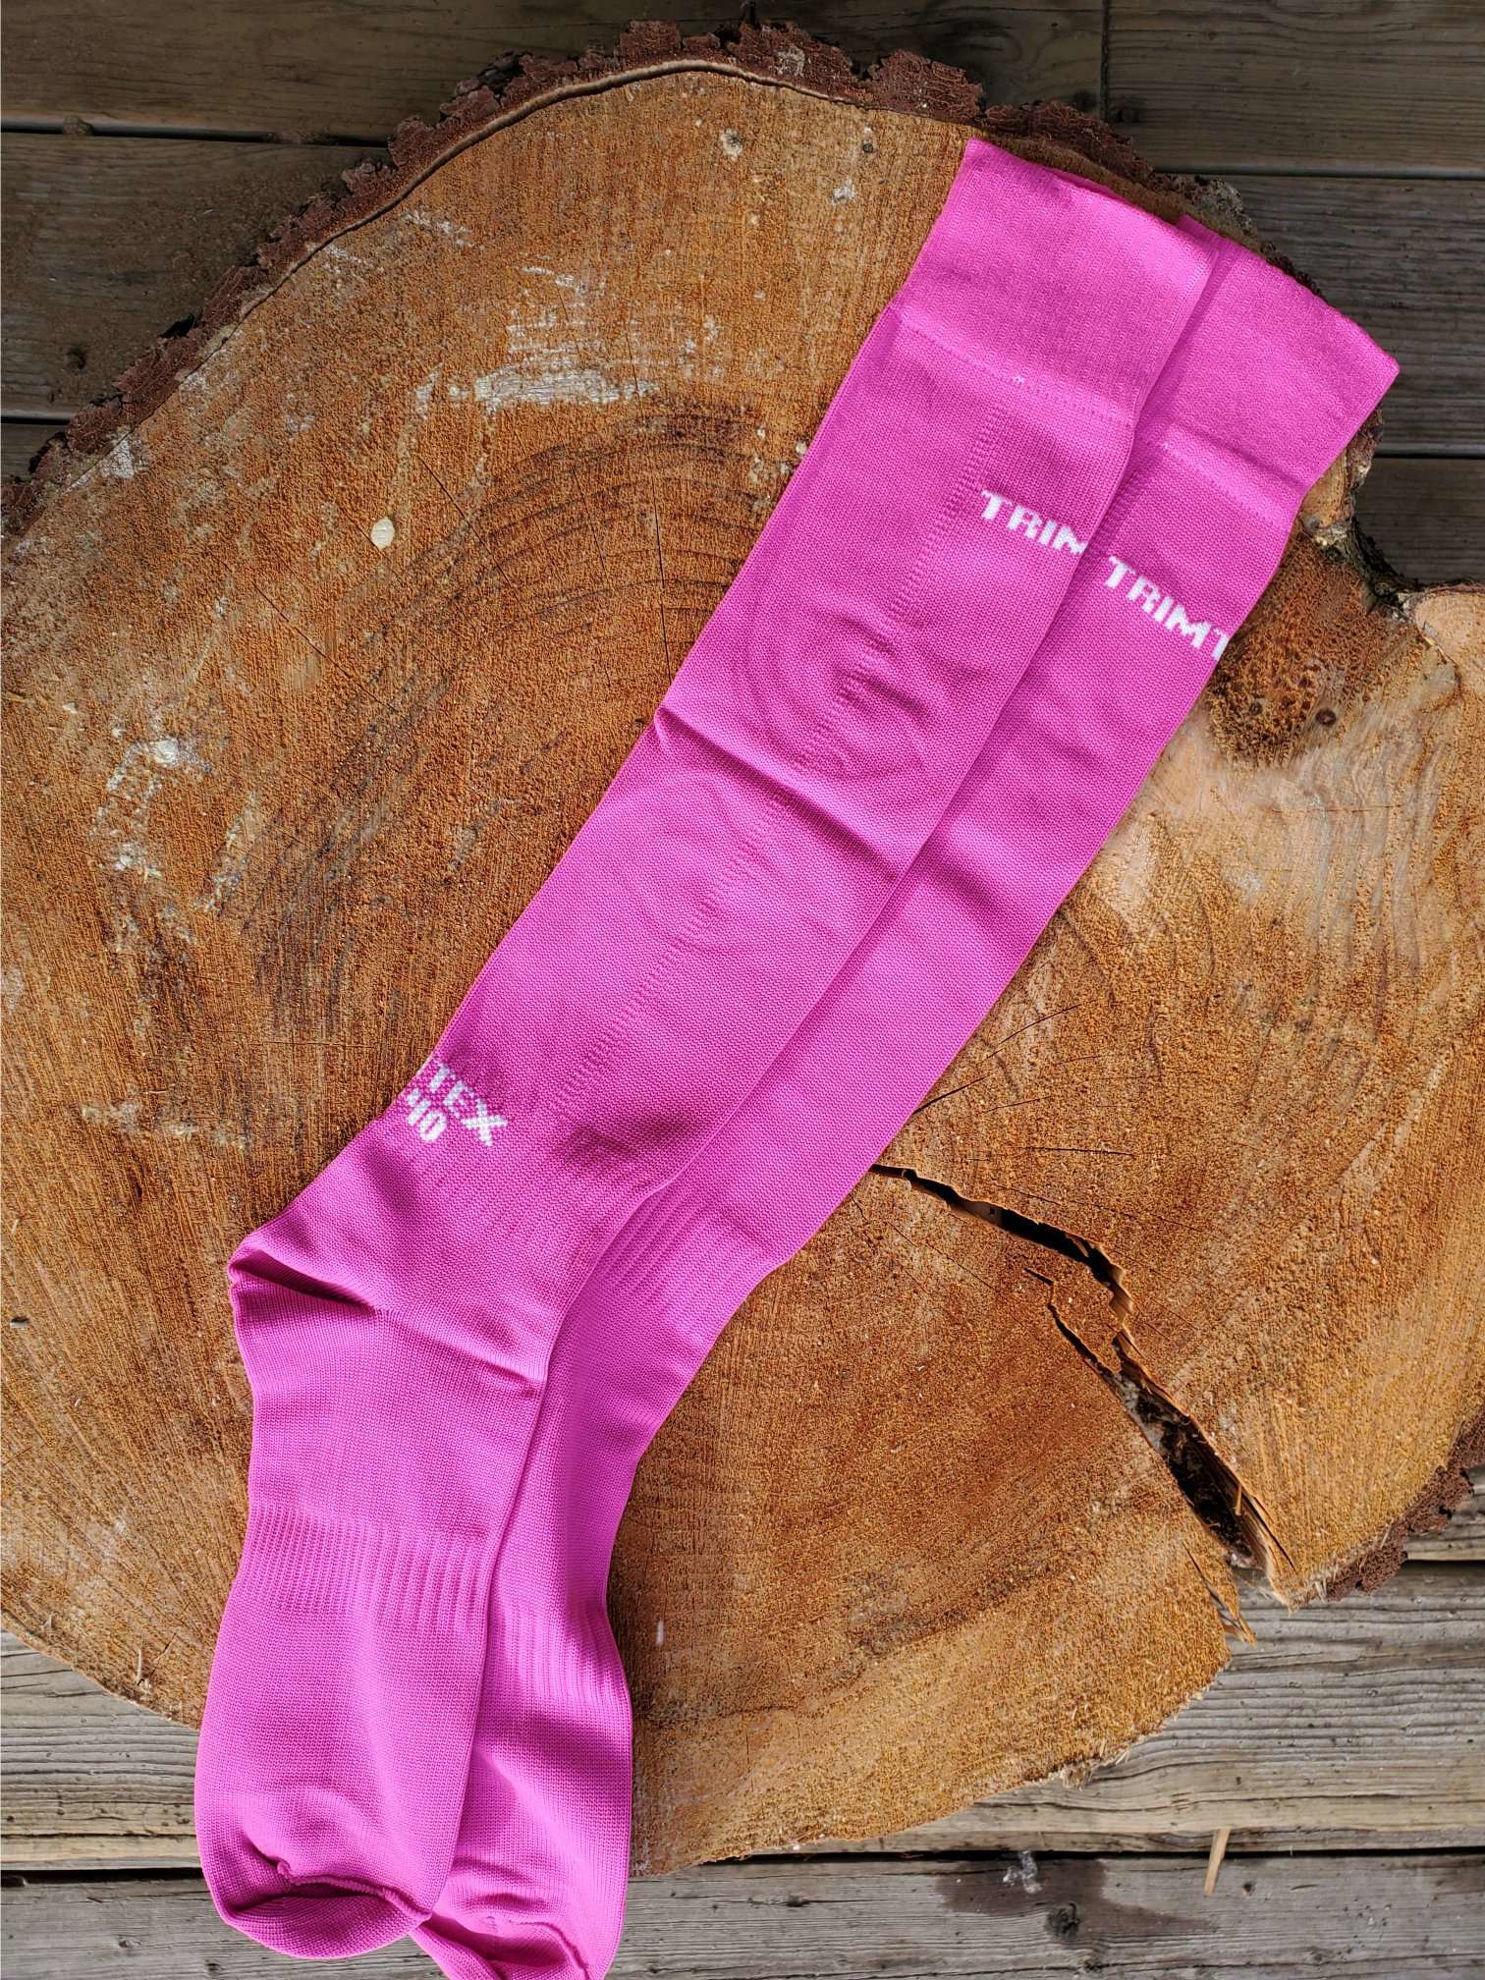 Picture of Trimtex Socks